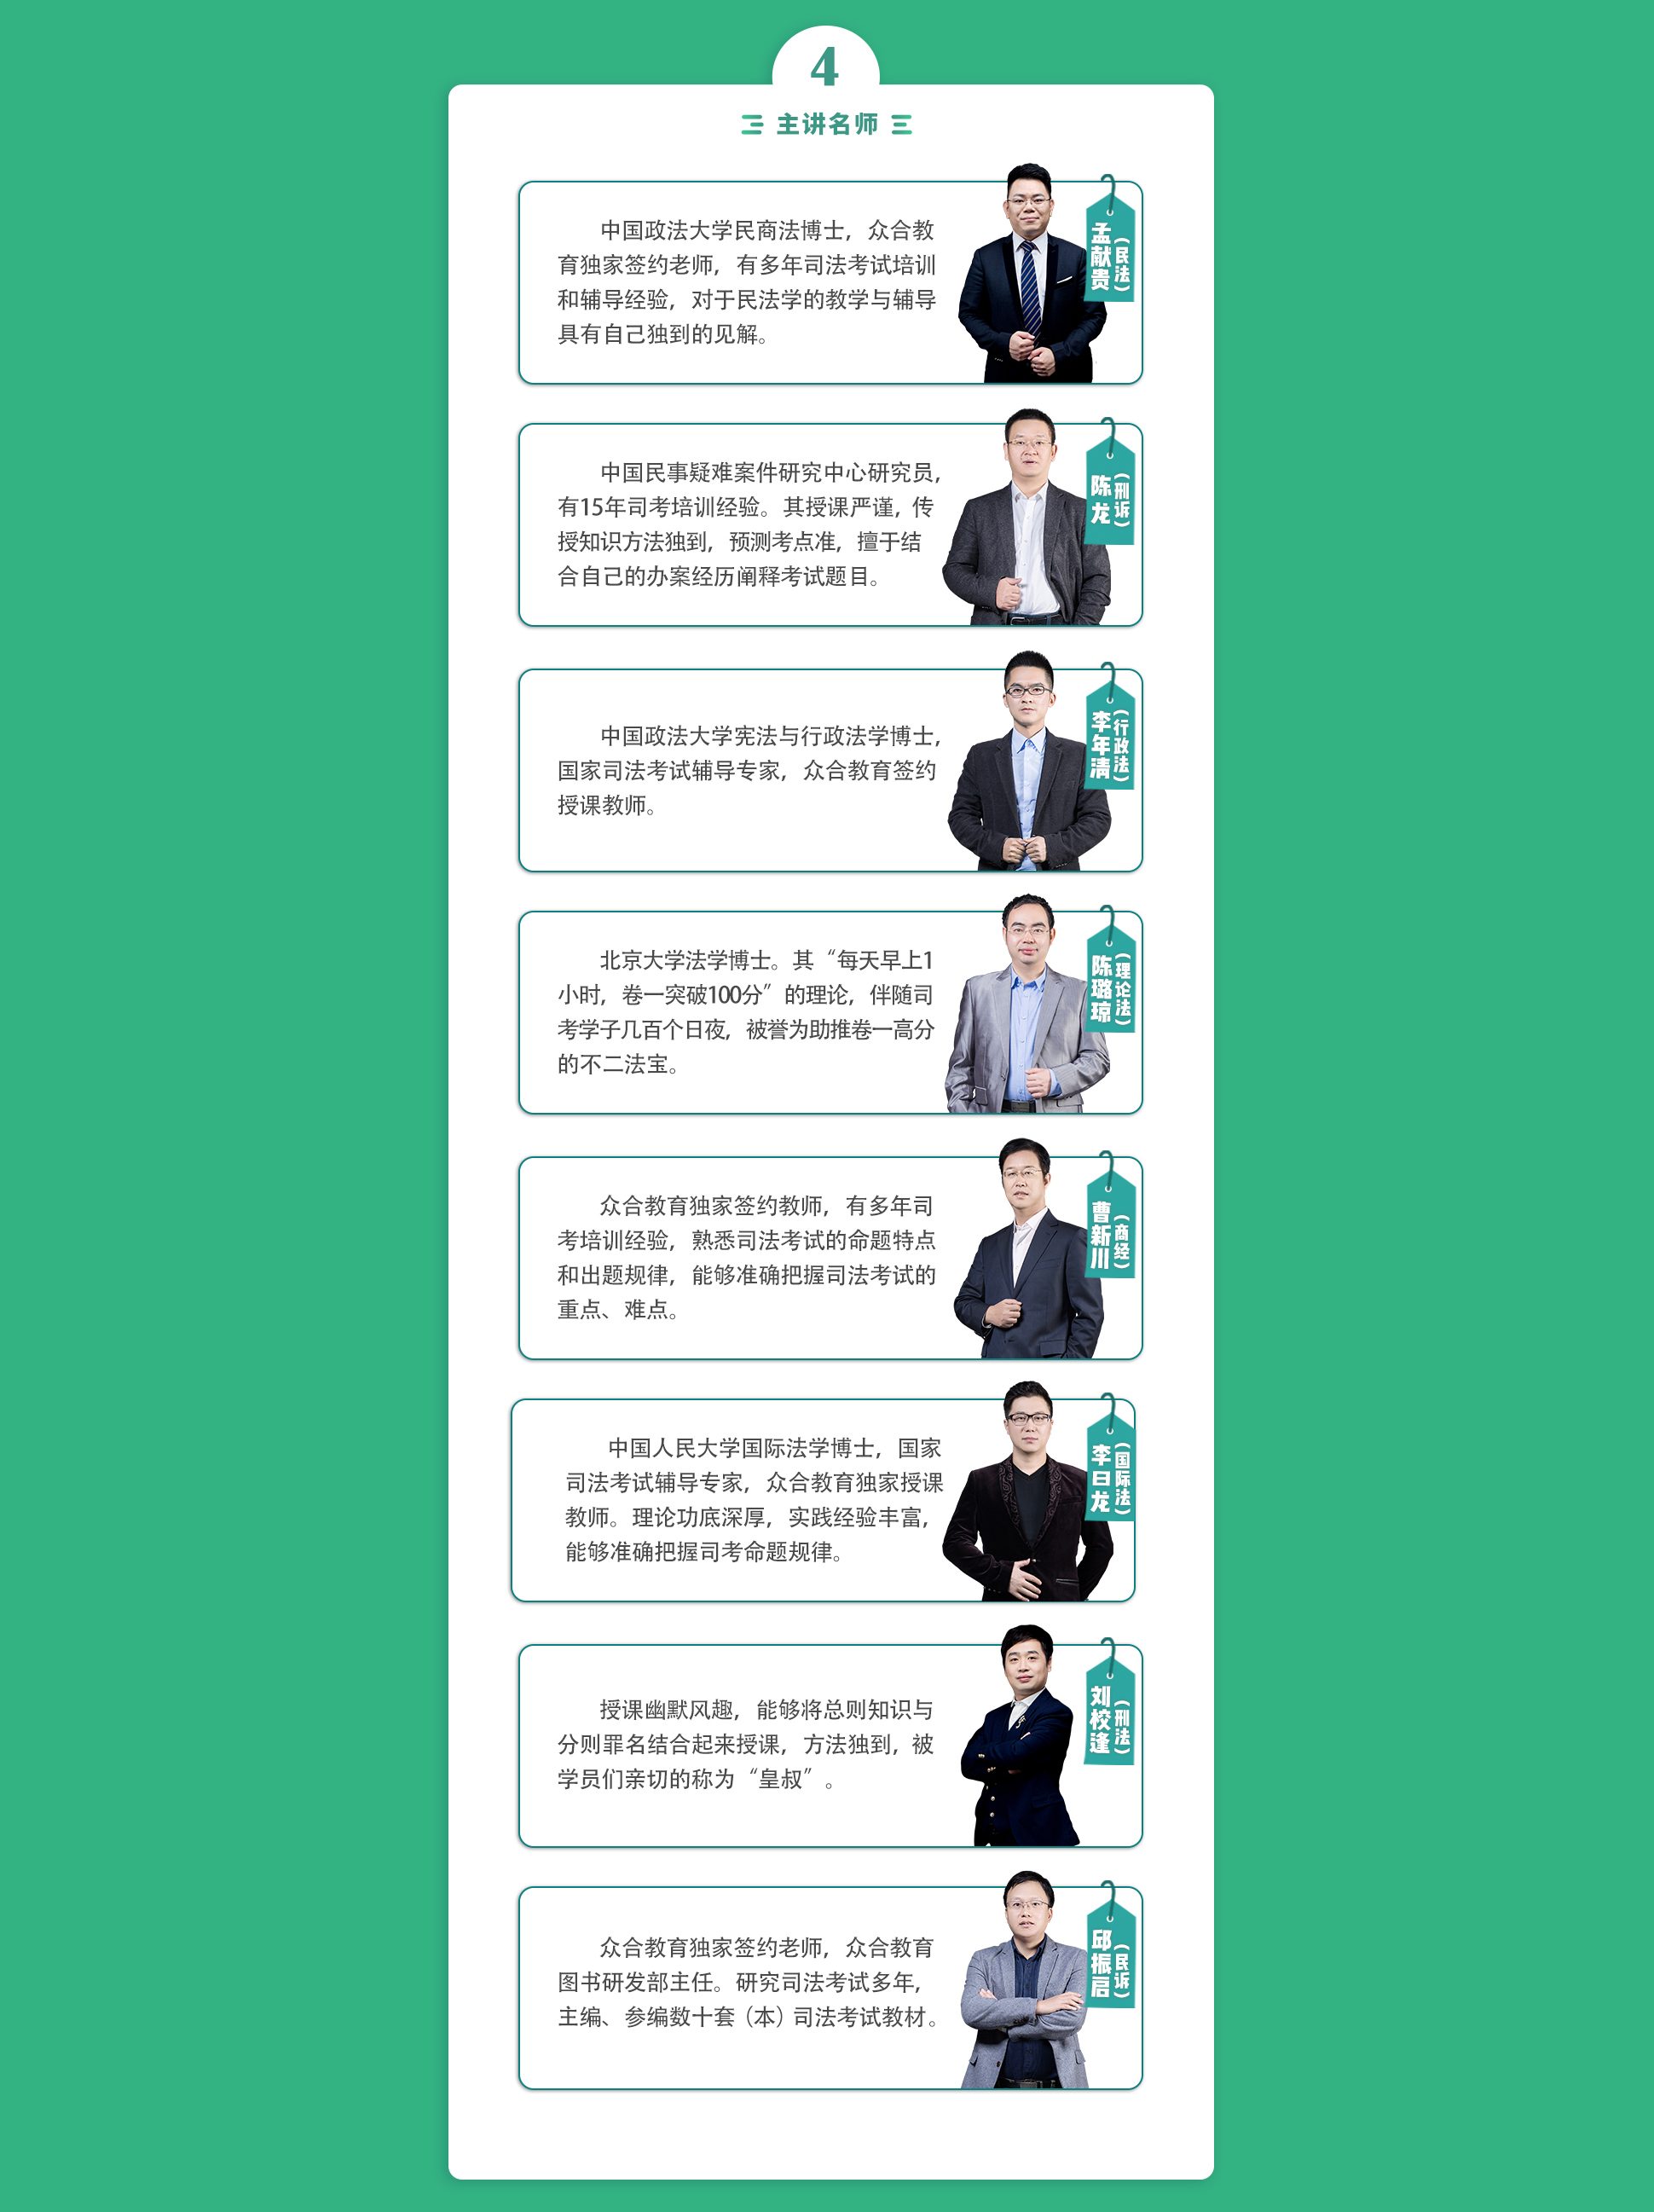 PC专题:9-9大纲精讲课-1940x_04.jpg